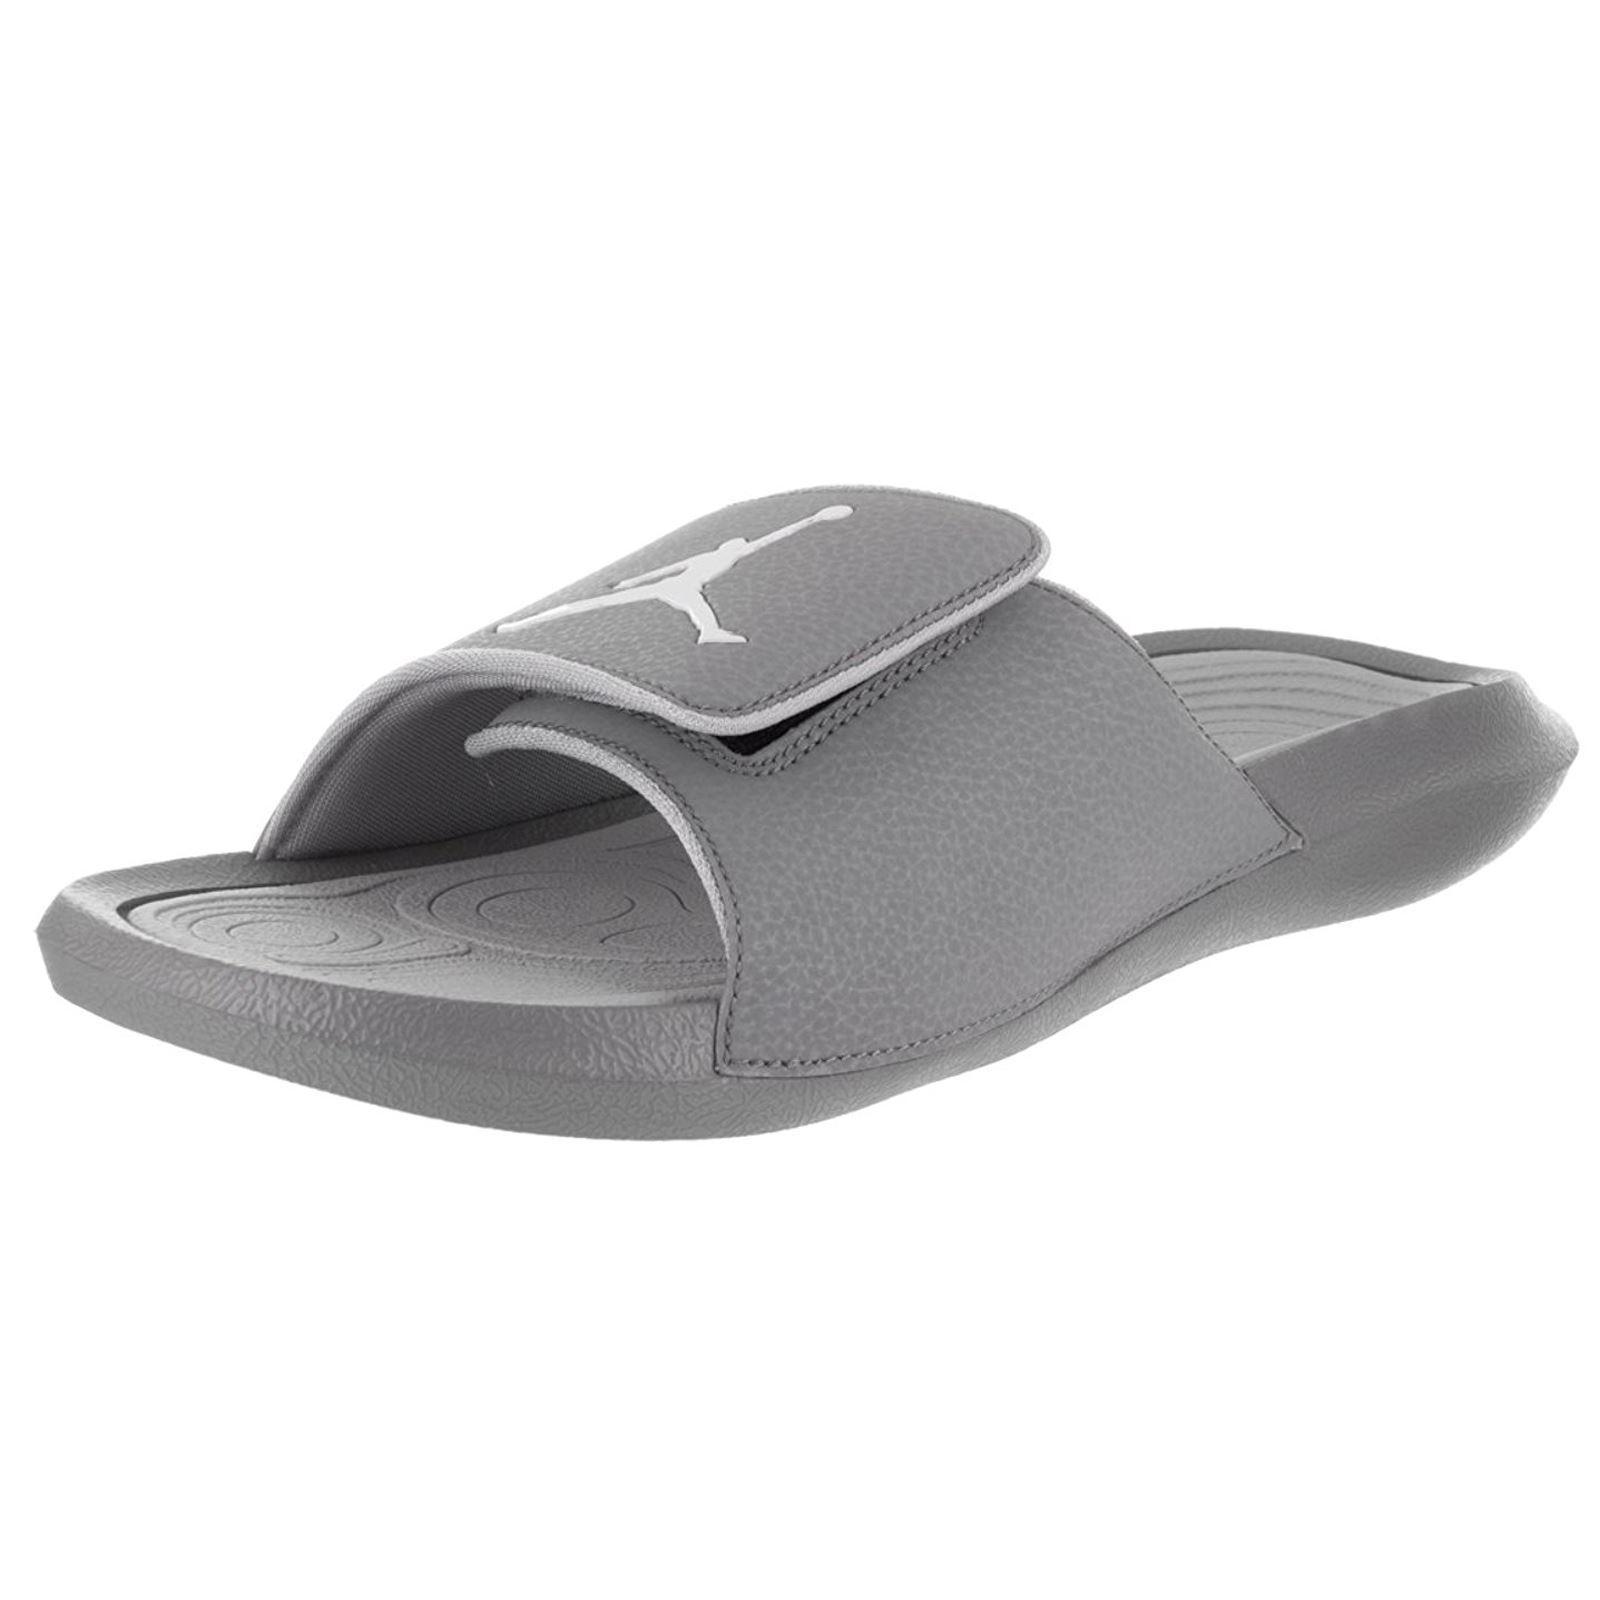 Nike Hydro 6 Cool Grey Mens Beach Slides Sandals